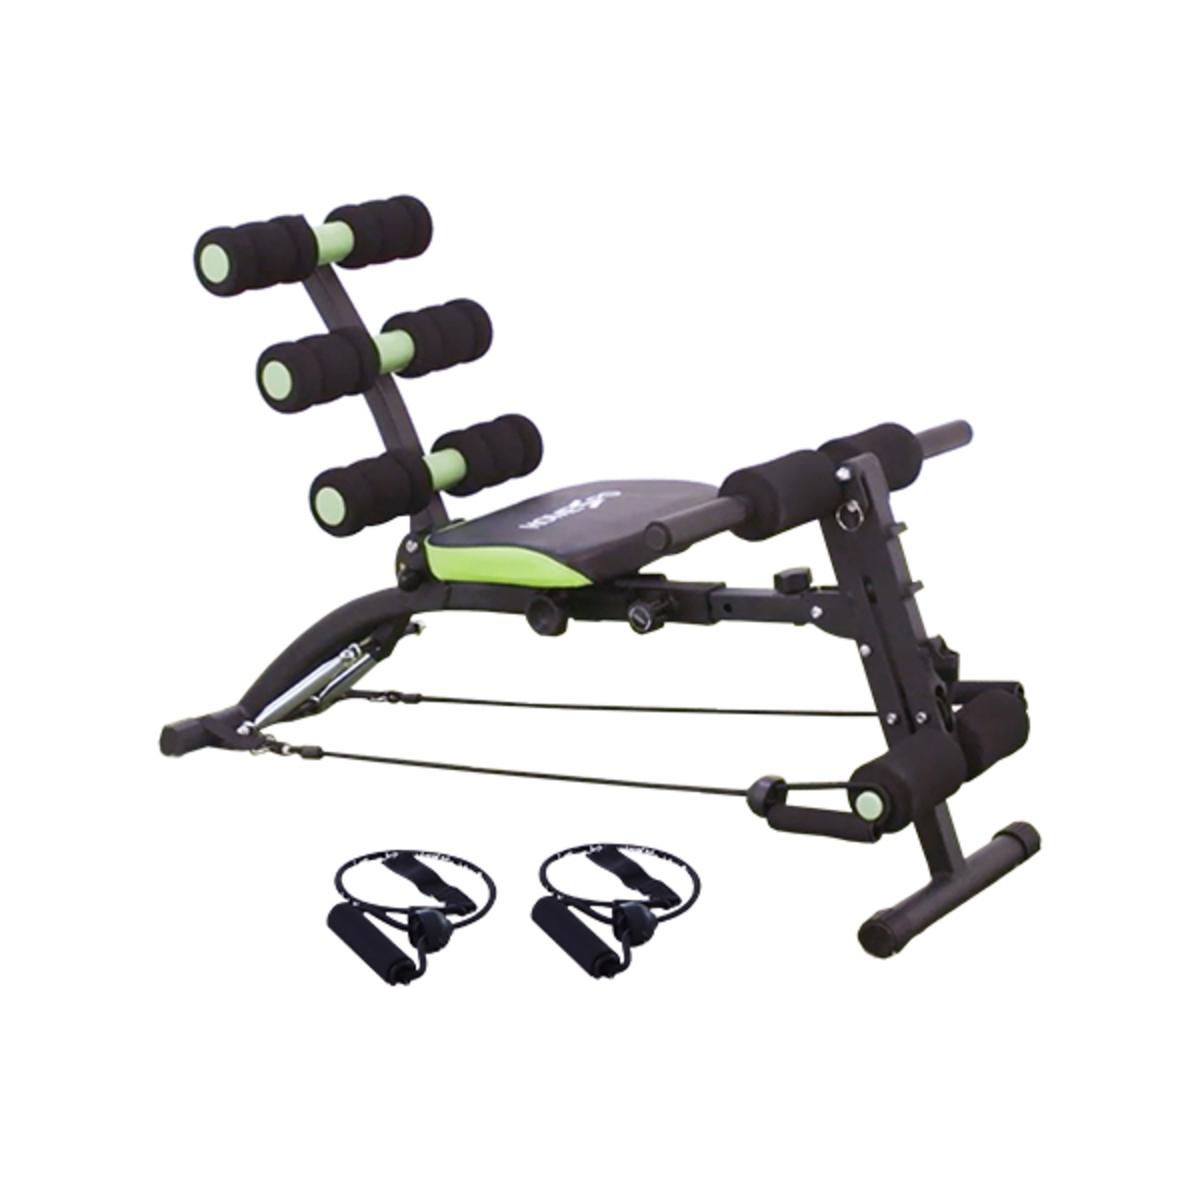 Homespo Total Core Fitness Machine Go Shop Alat Fitnes Roll